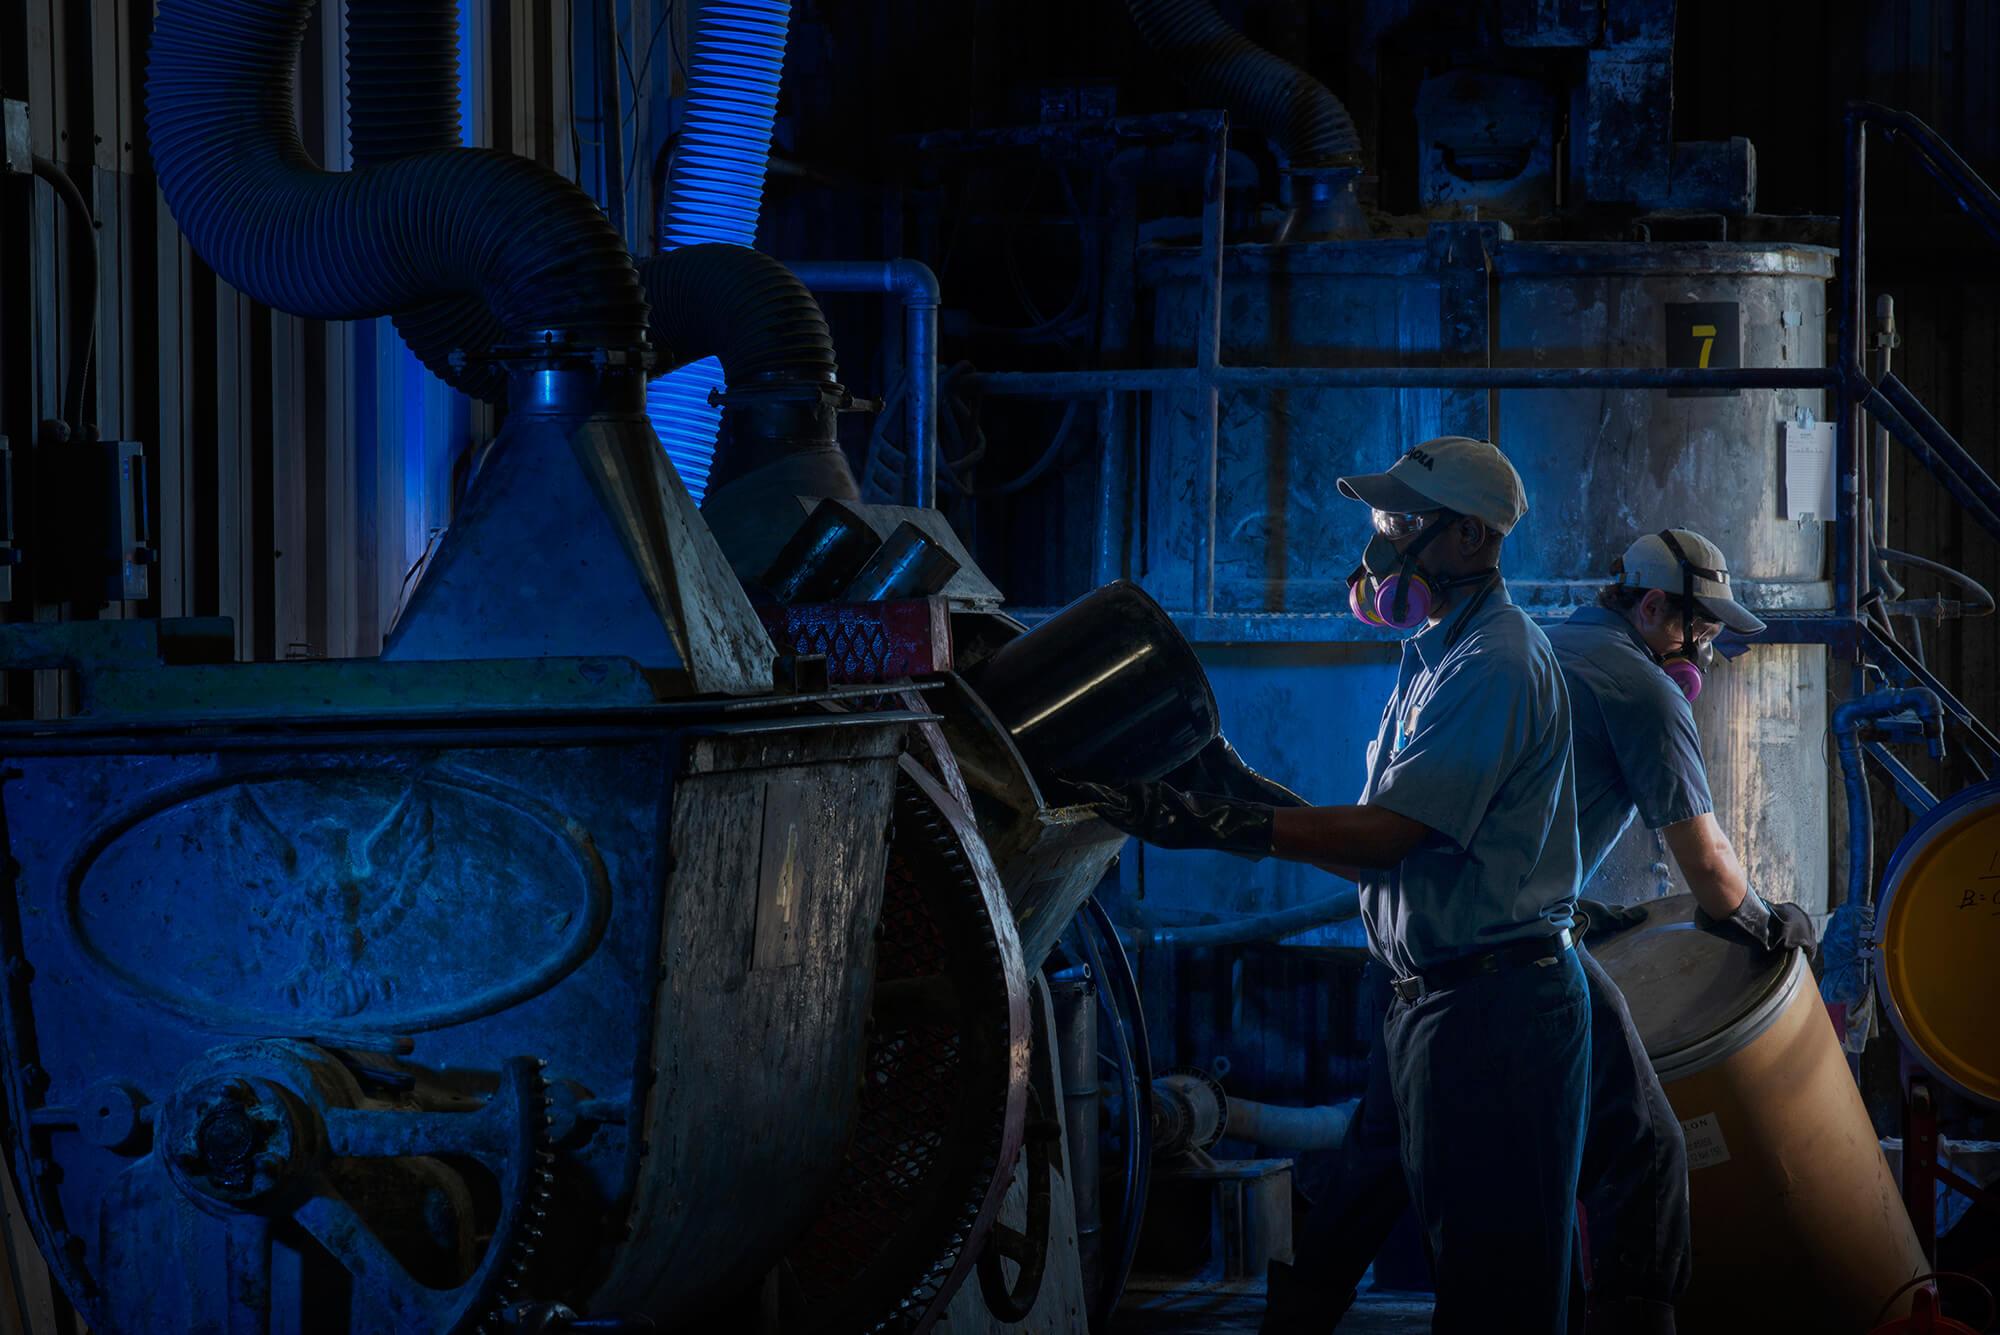 Industrial Blending